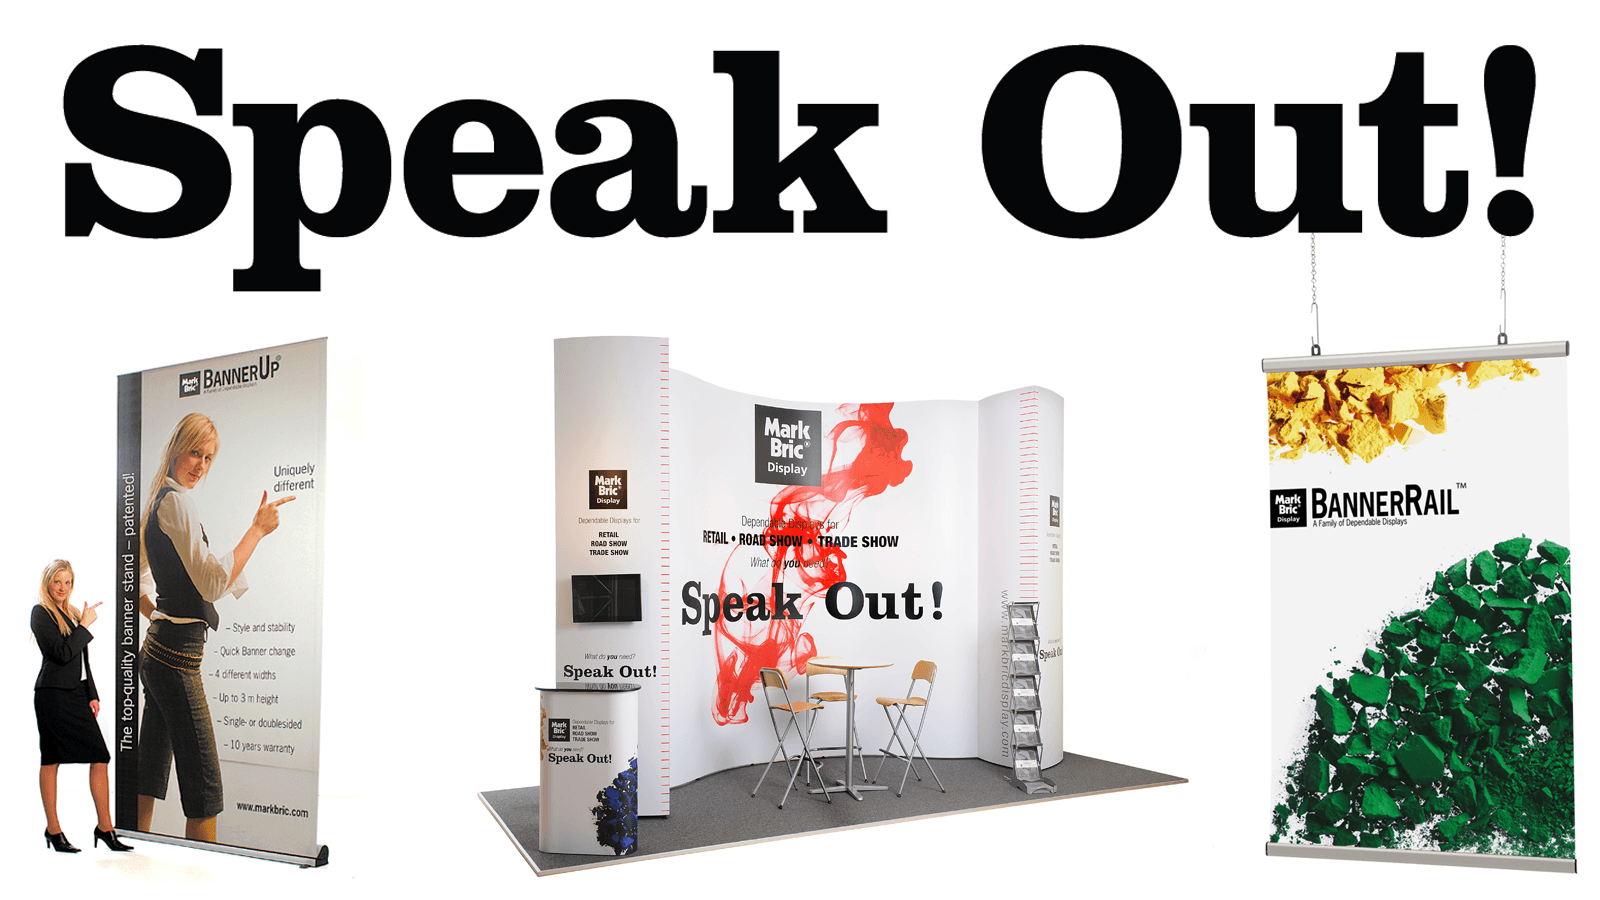 speakout-slayt